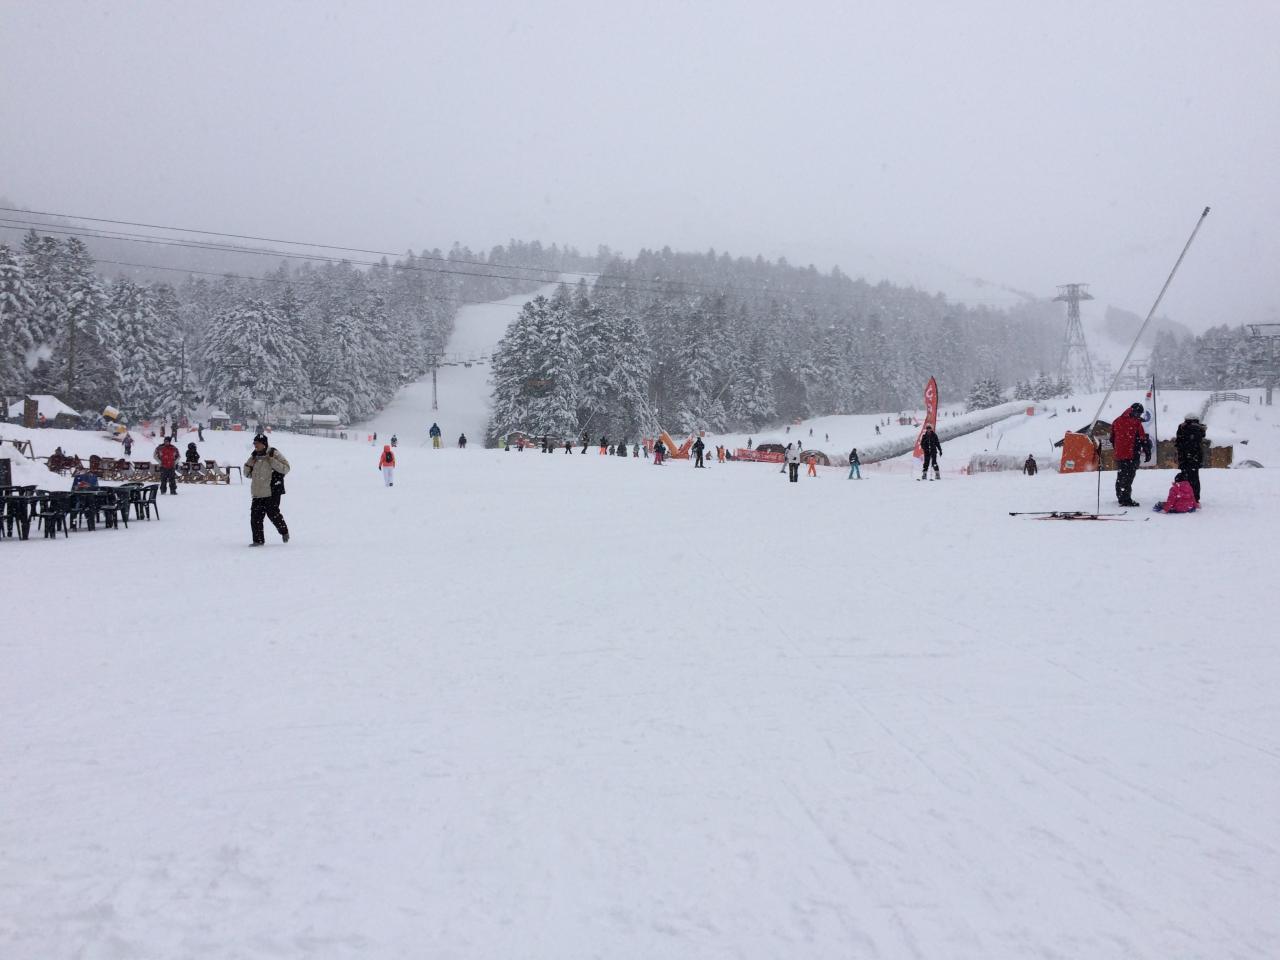 vendredi aprem : il neige !